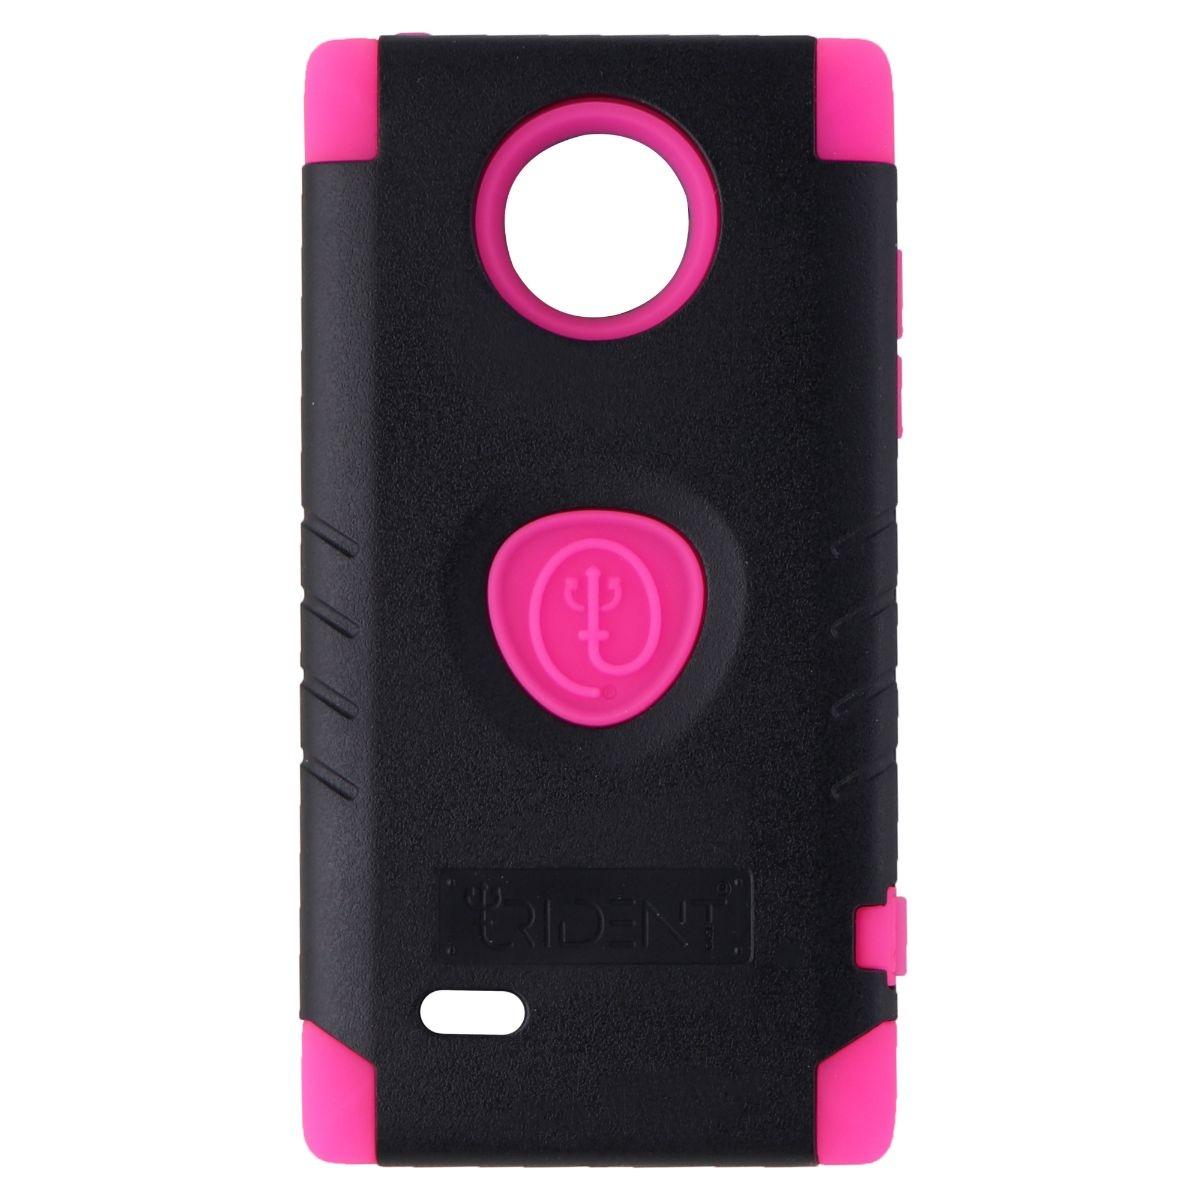 Trident Aegis Series Dual Layer Case for LG Spectrum 2 - Black/Pink